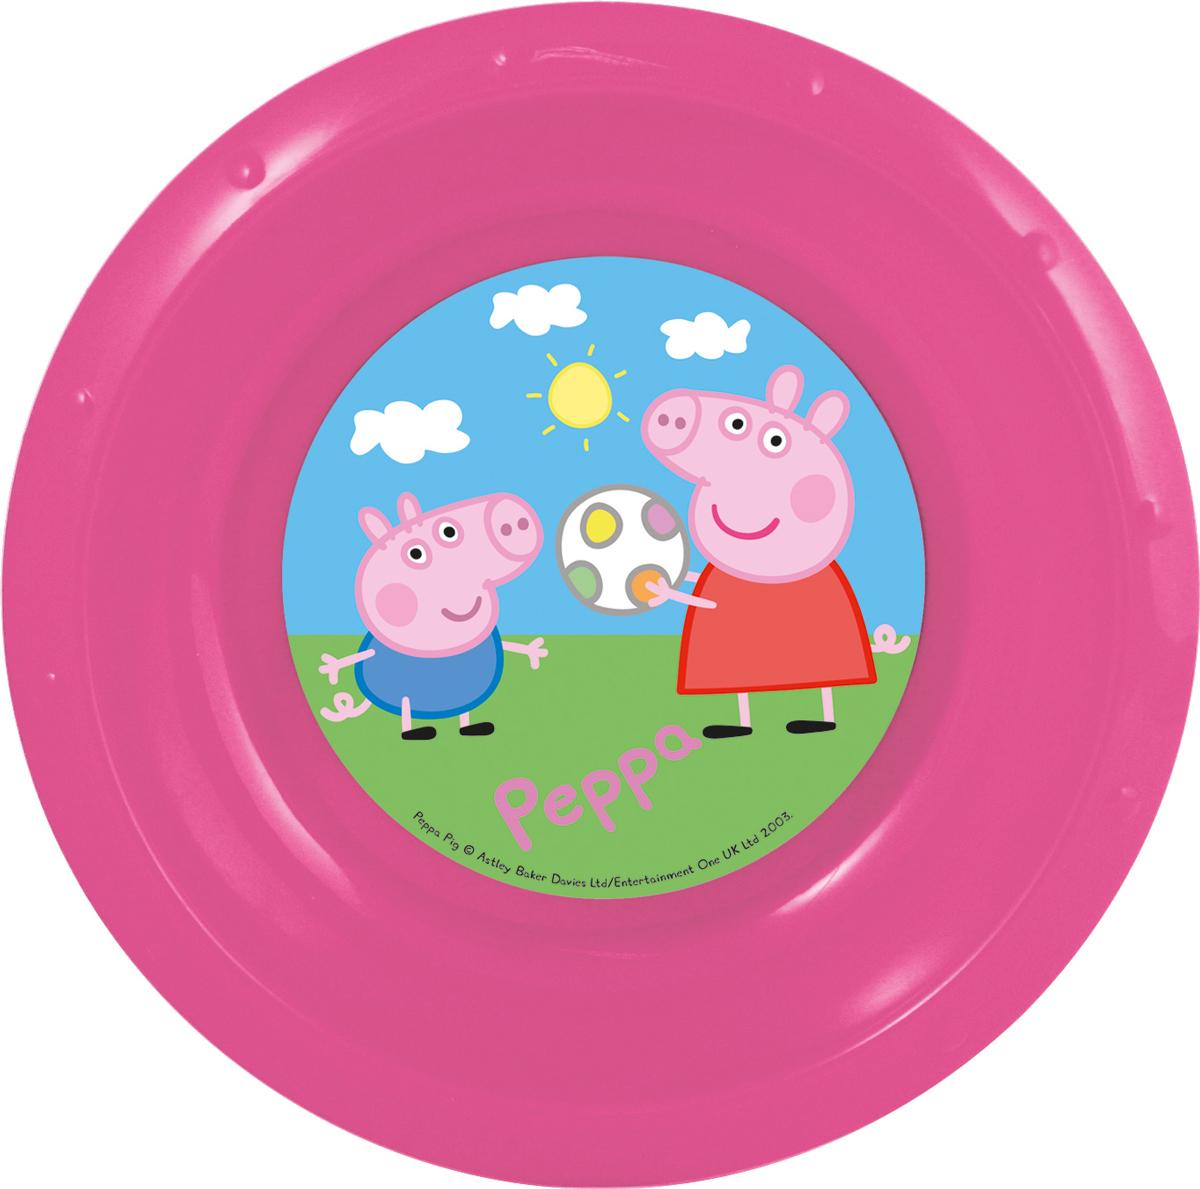 Peppa Pig Миска детская Свинка Пеппа52811Миска ПЕППА ПИГ 16 см